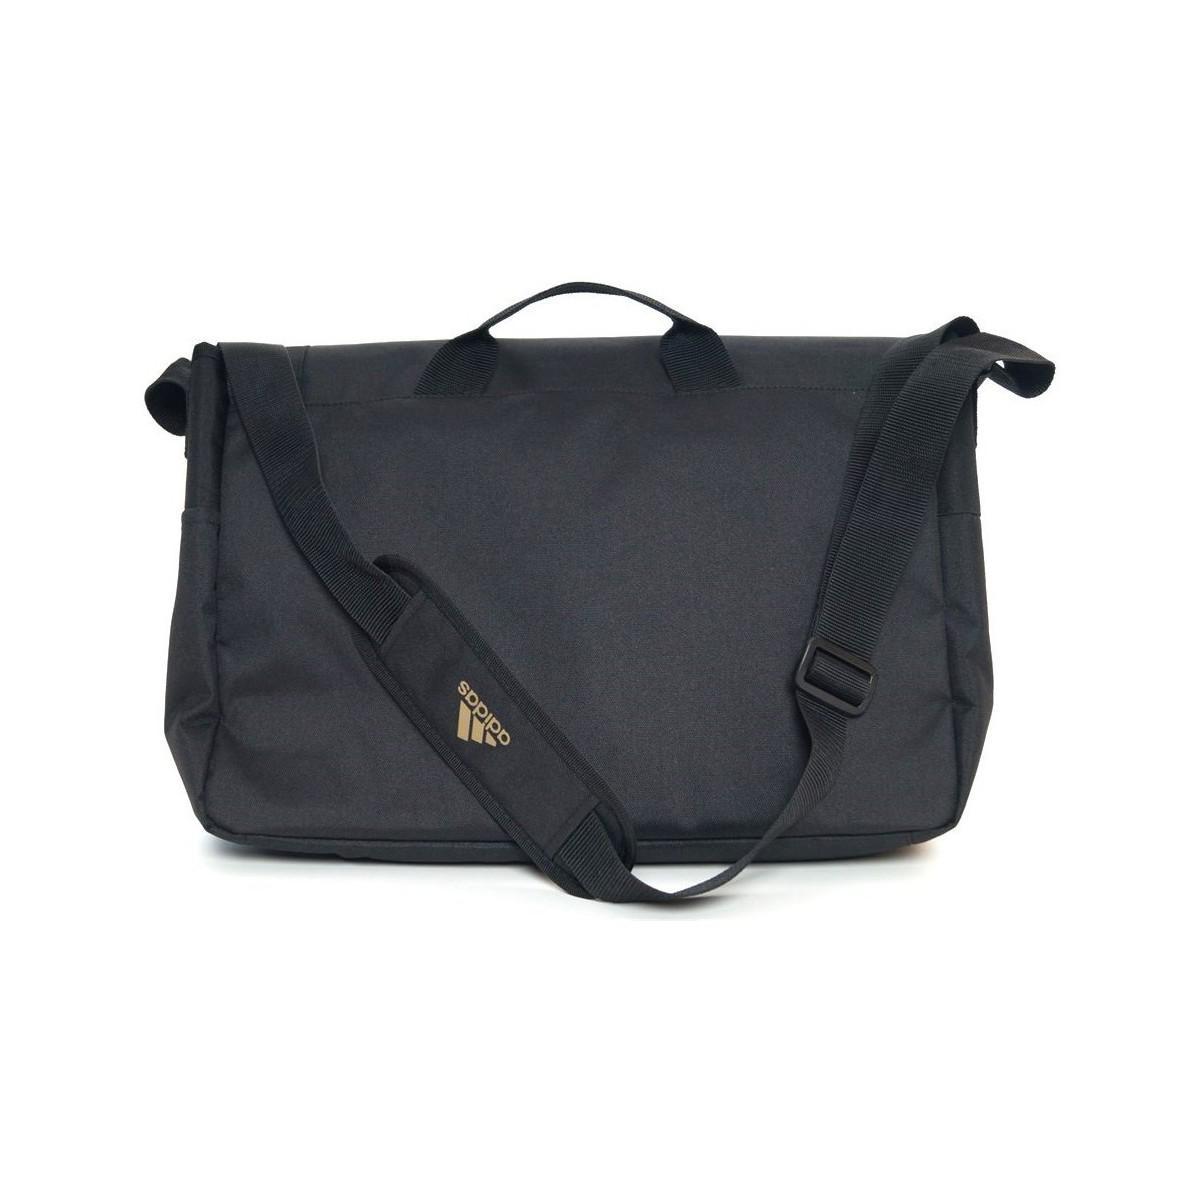 adidas Afa Mess Men s Messenger Bag In Black in Black for Men - Lyst d896a94122